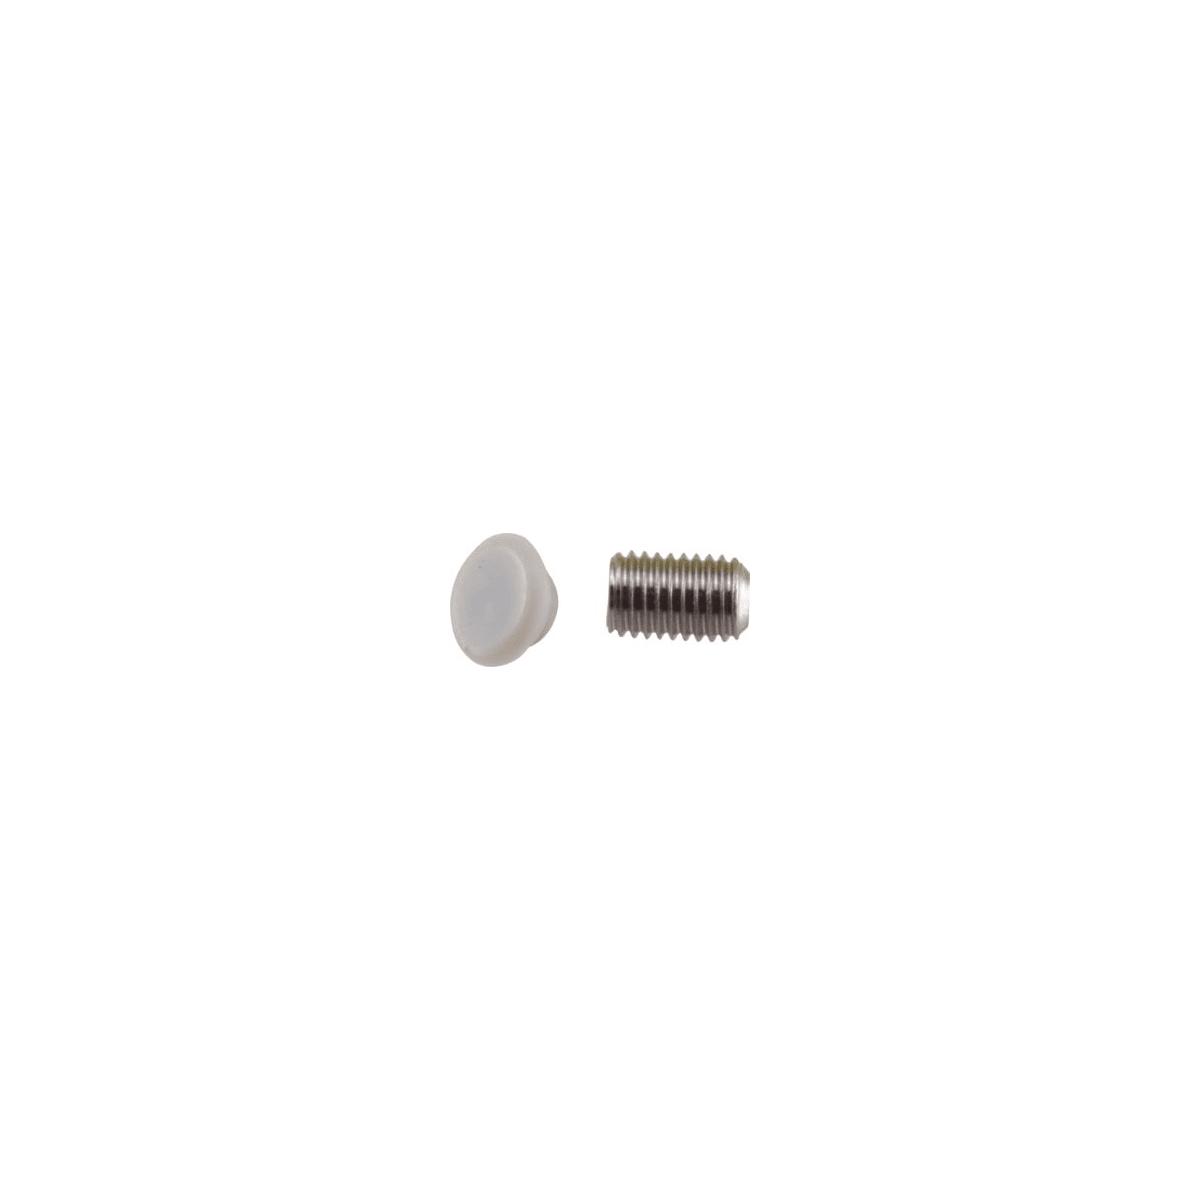 Chrome Peerless RP73178 Button with Set Screw